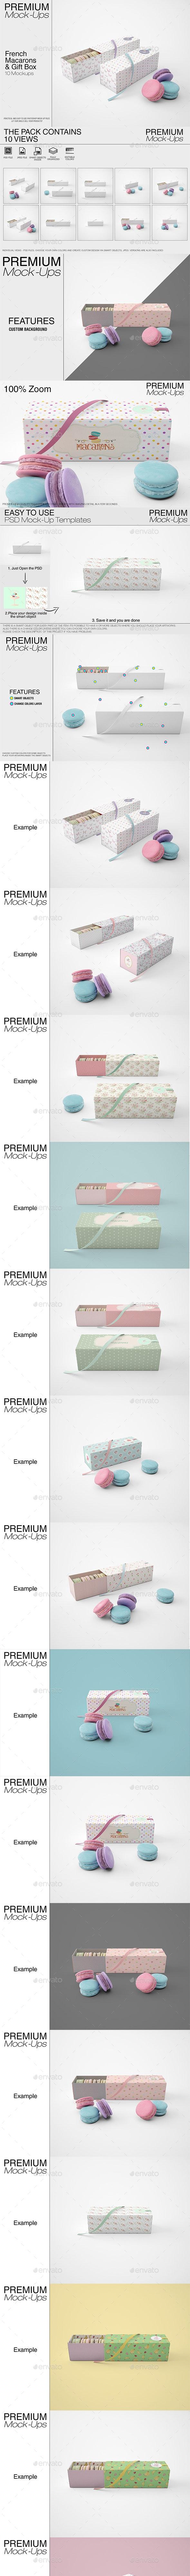 French Macarons & Gift Box Mockup Pack - Print Product Mock-Ups